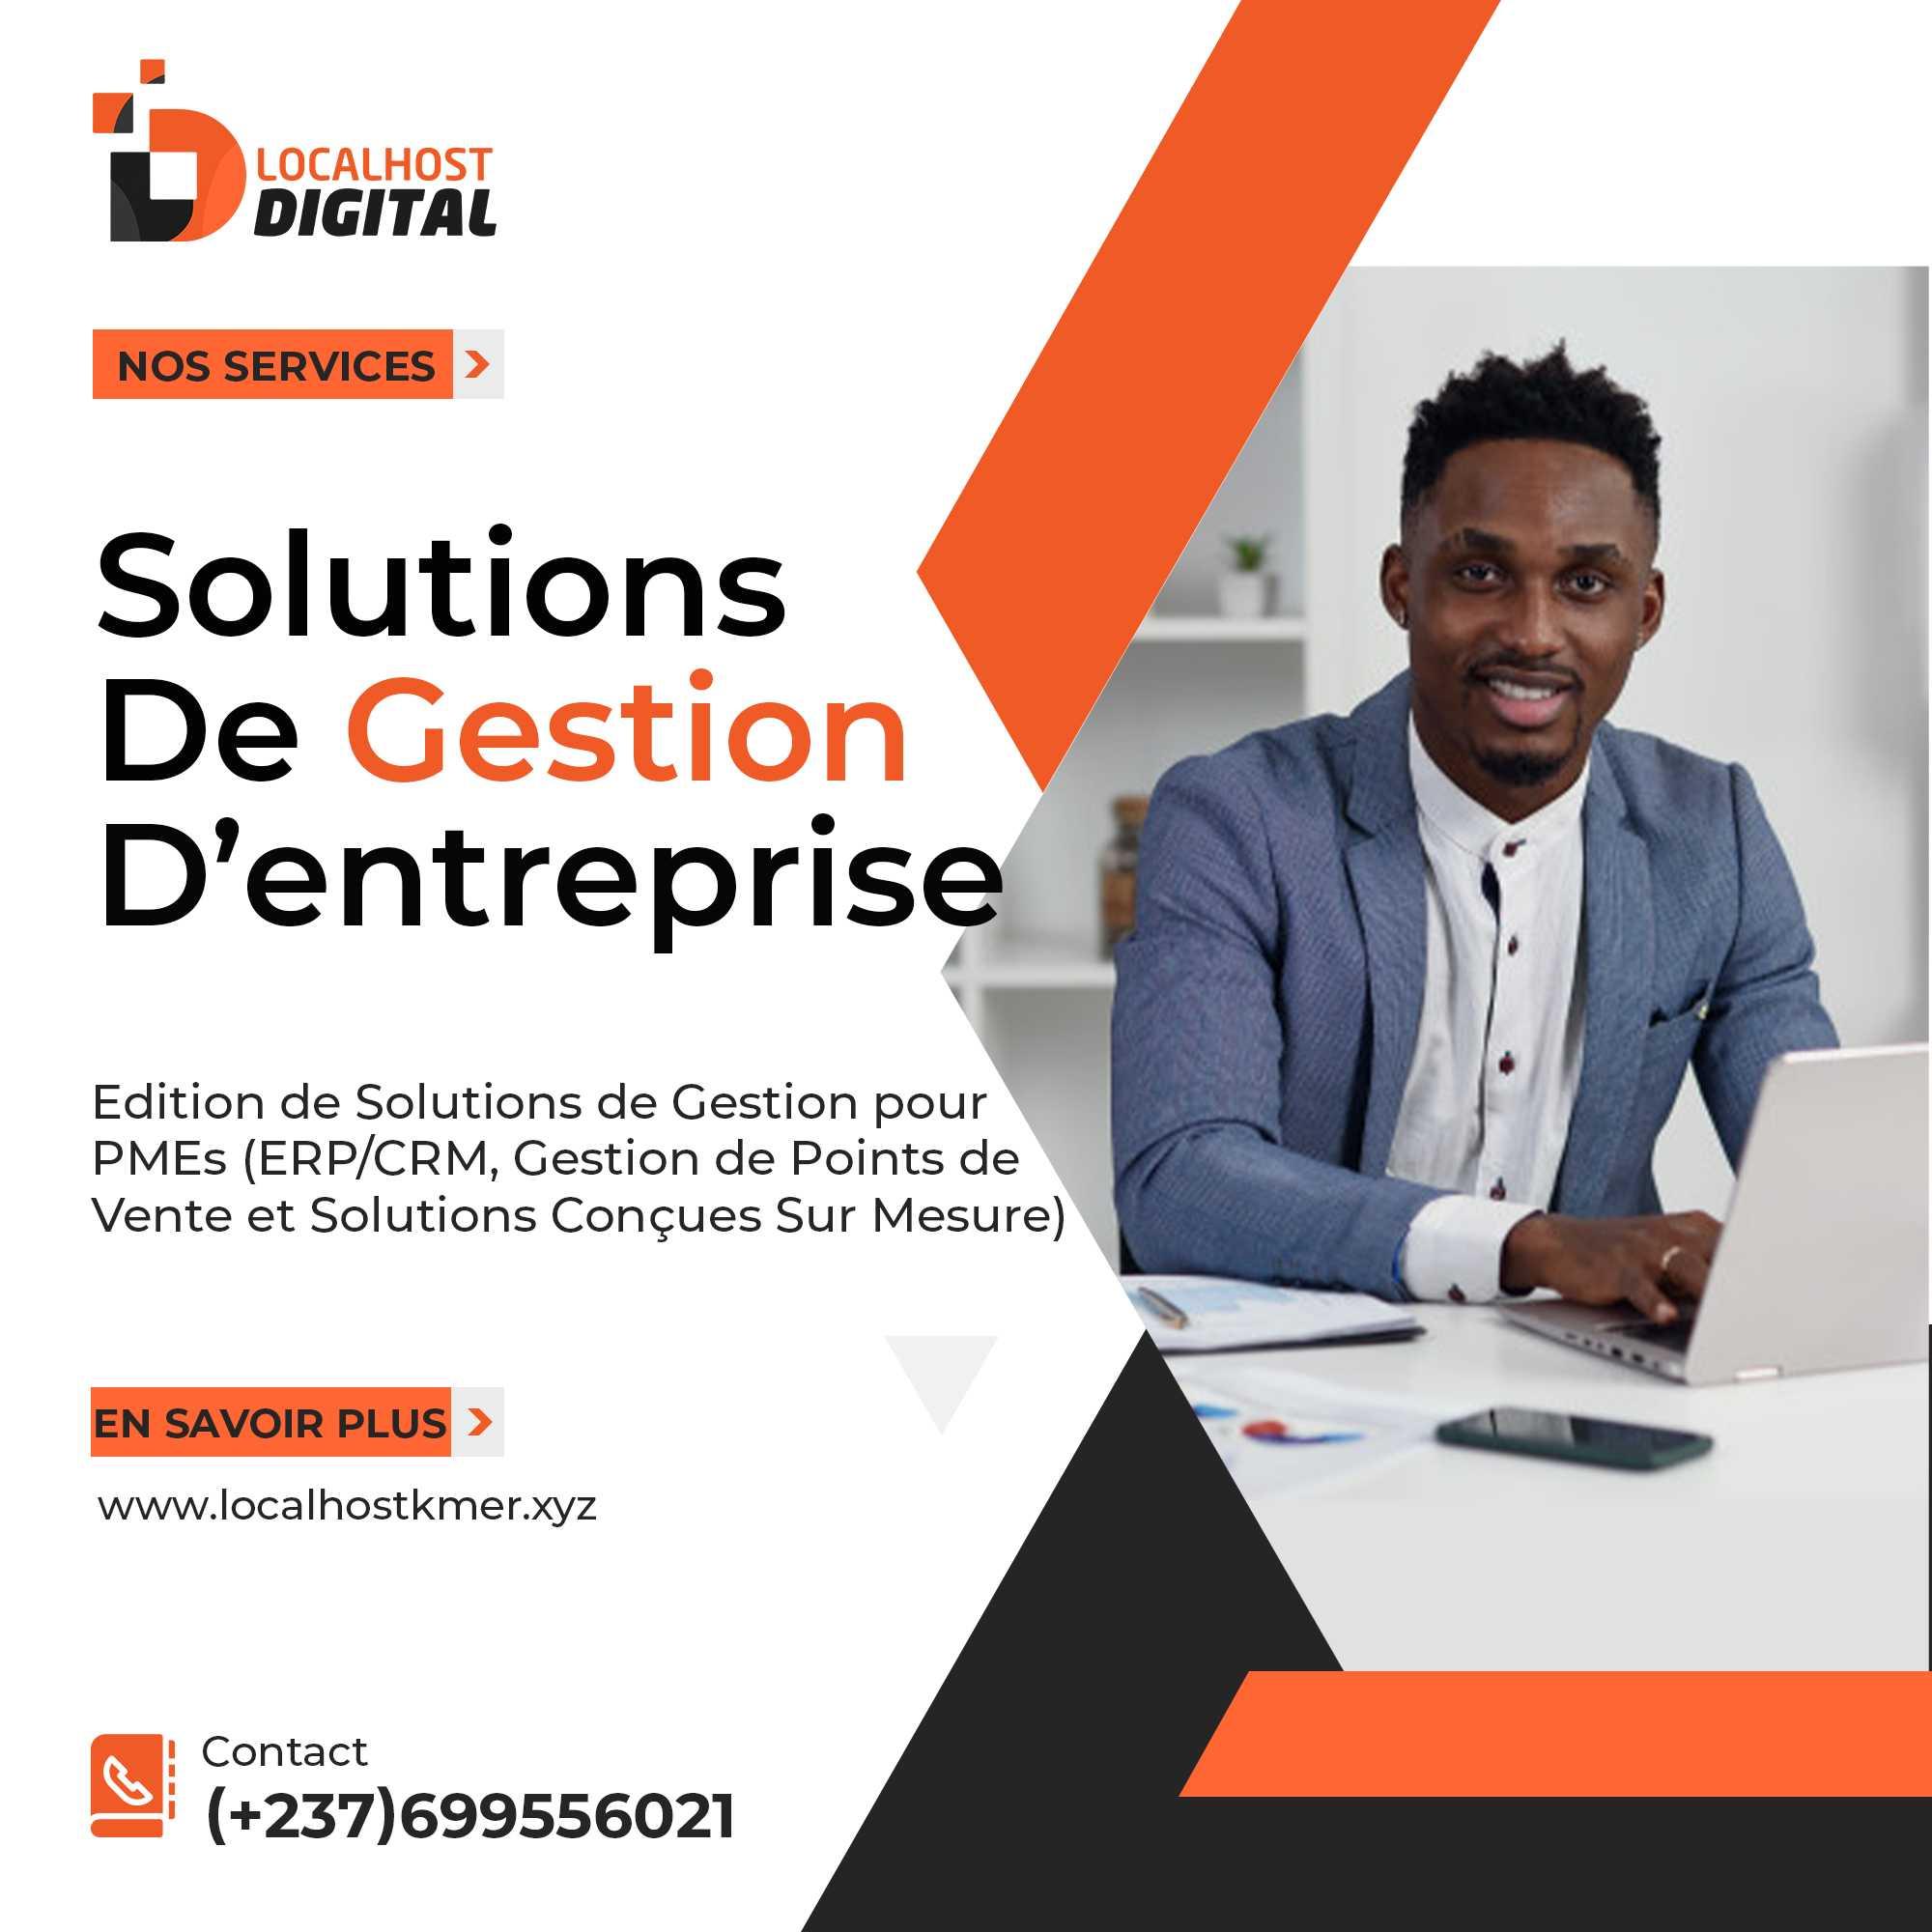 LocalHost Digital Services